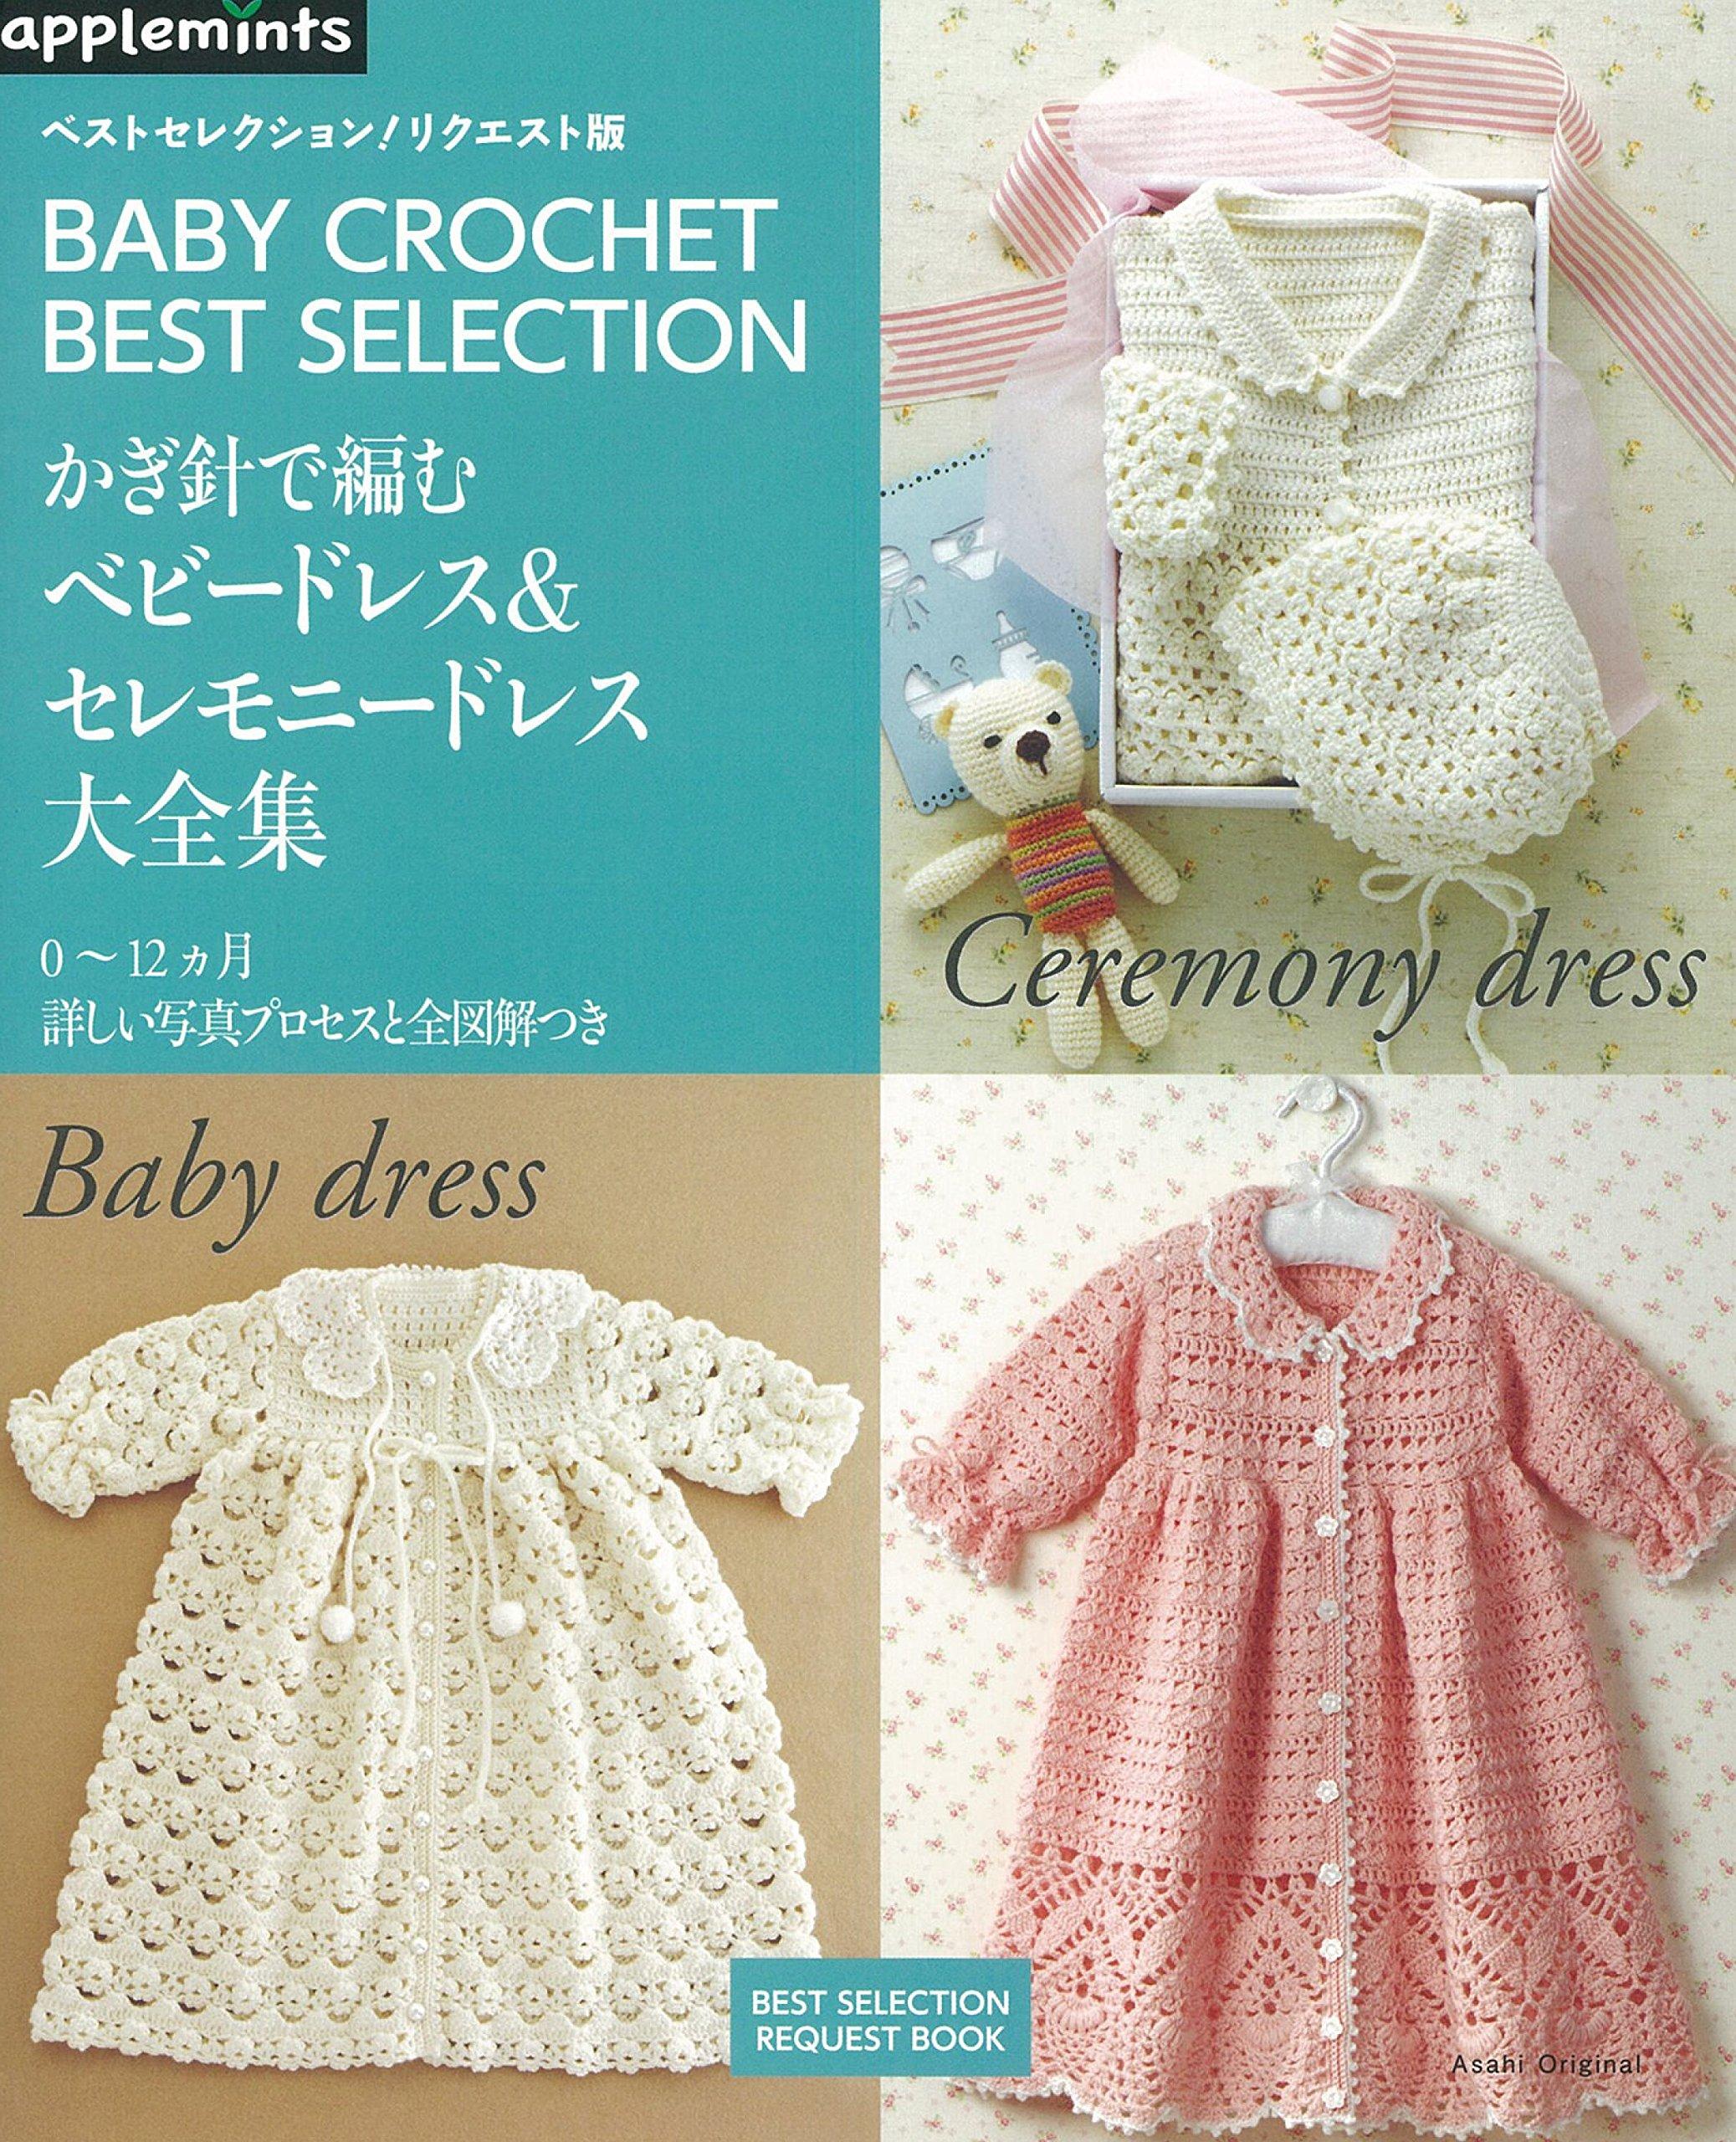 Ceremony & baby dress Best Crochet Selection